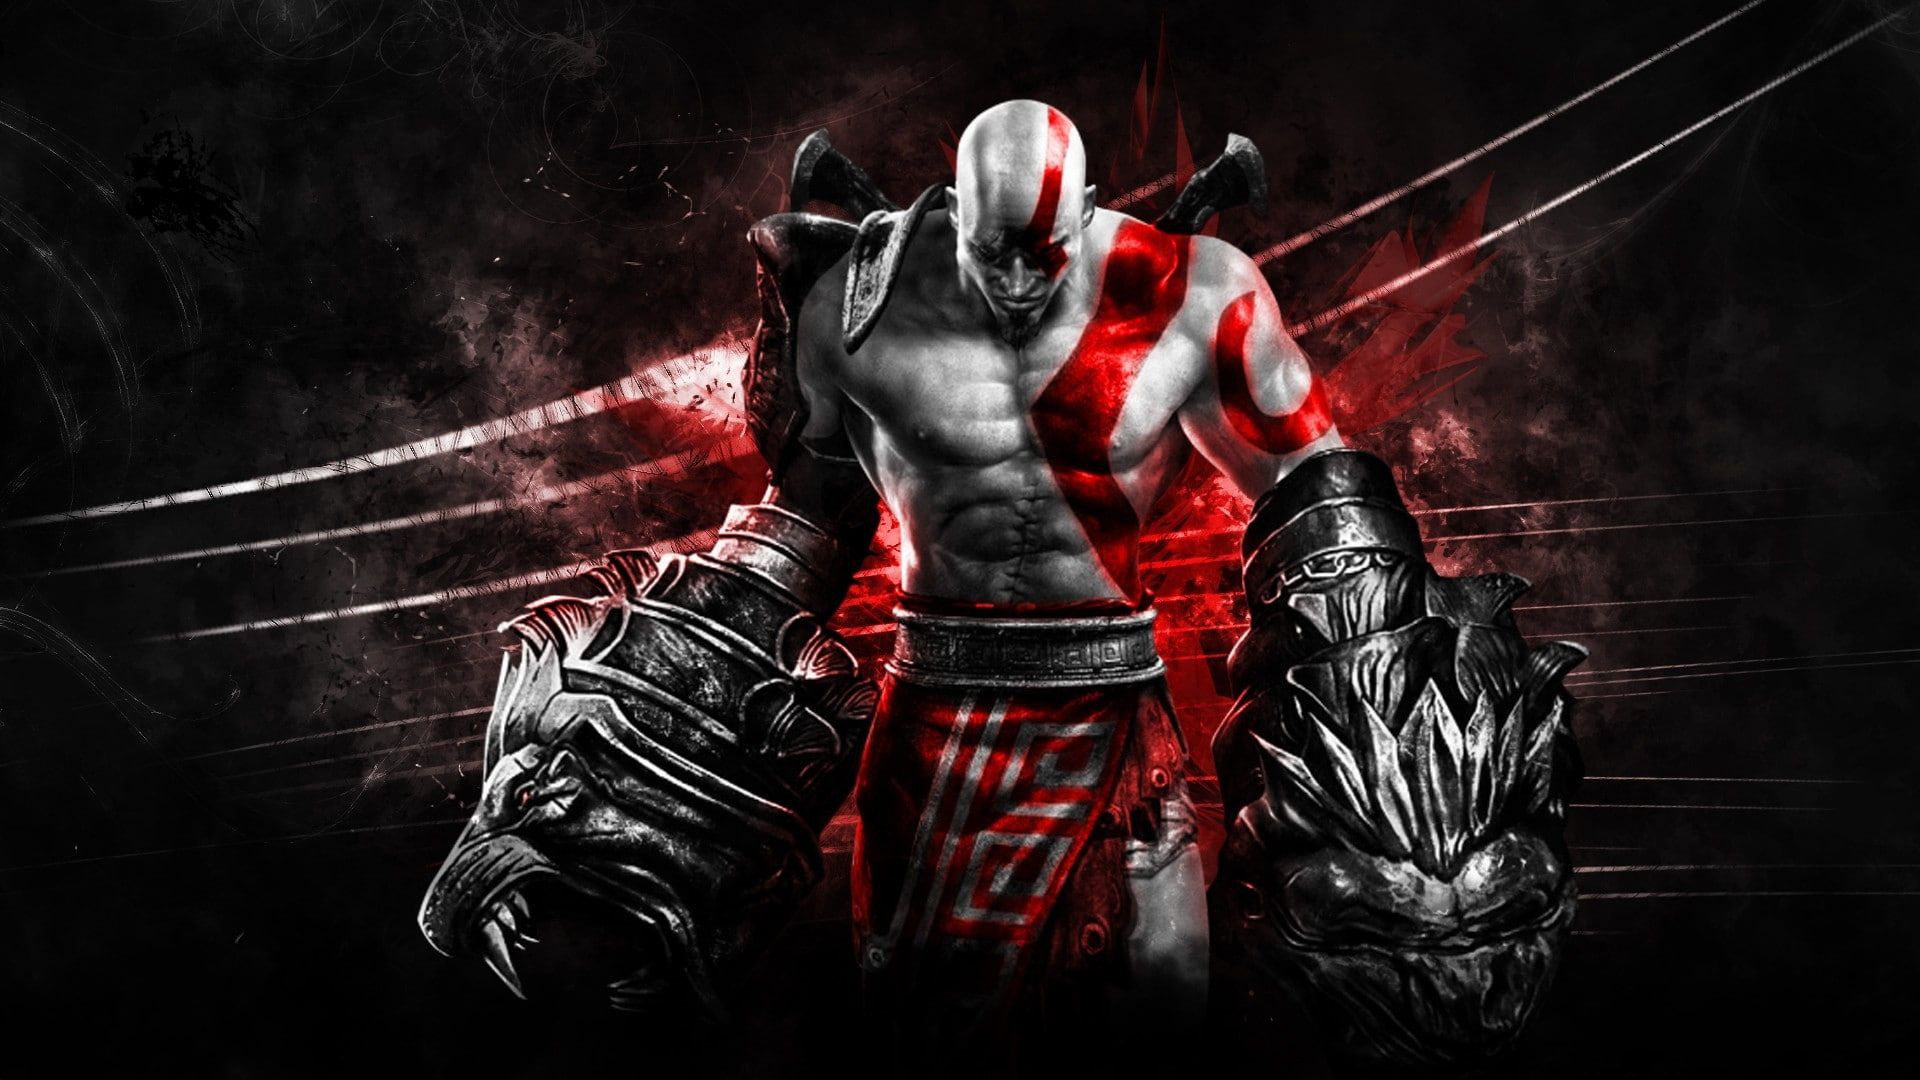 Video Games God Of War God Of War 2 God Of War 3 God Of War 4 Kratos God Of War Ascension God Of Wa Vi Kratos God Of War Kratos